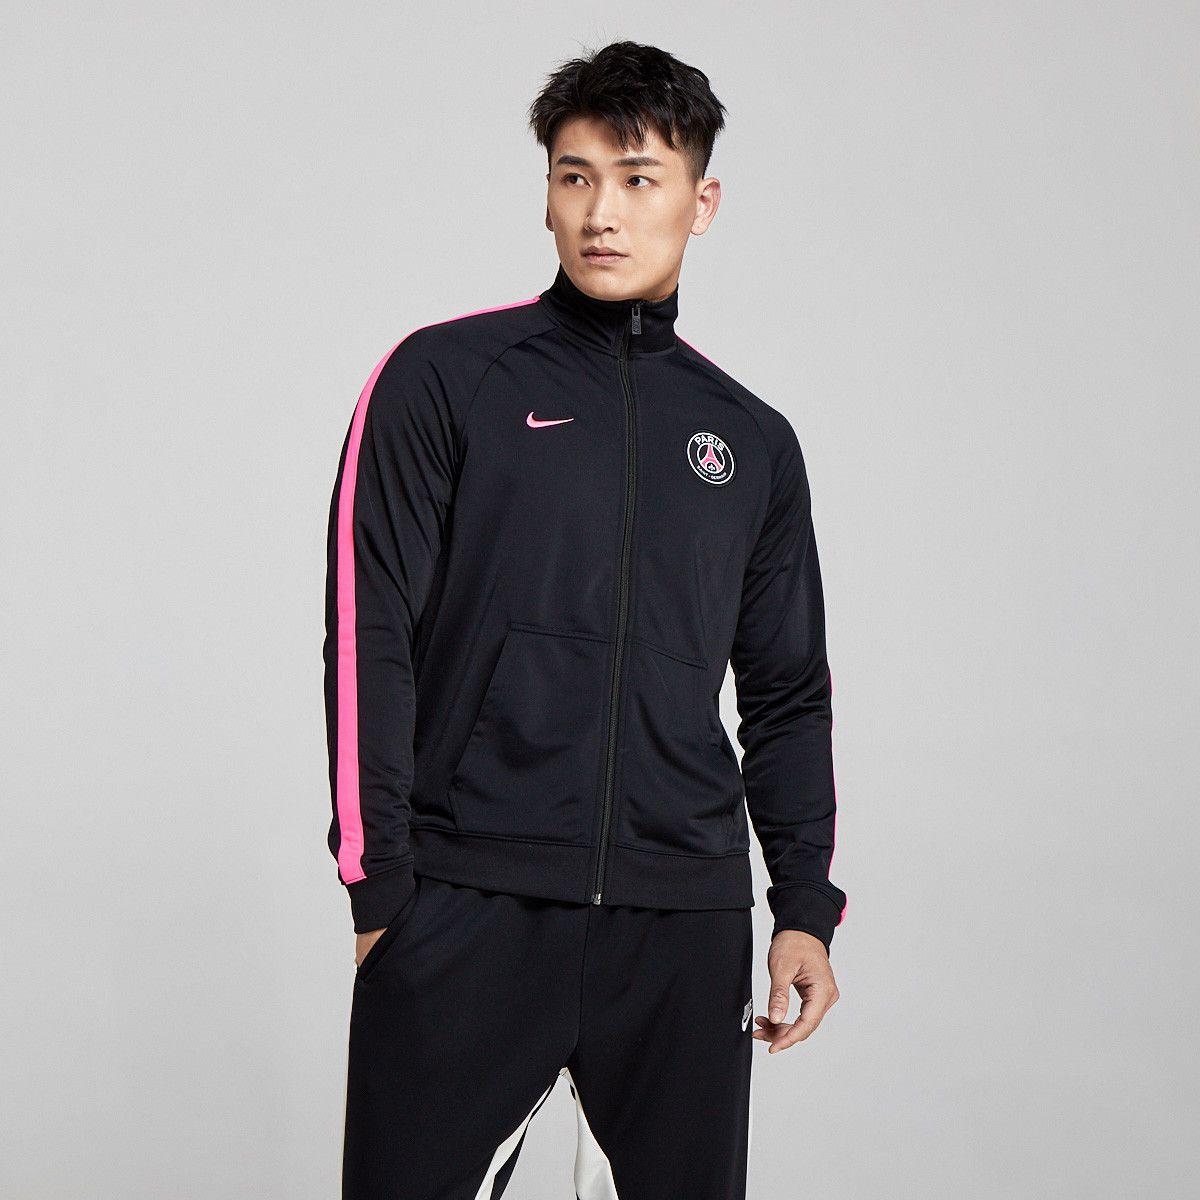 Jaqueta PSG Track Nike 2019/20